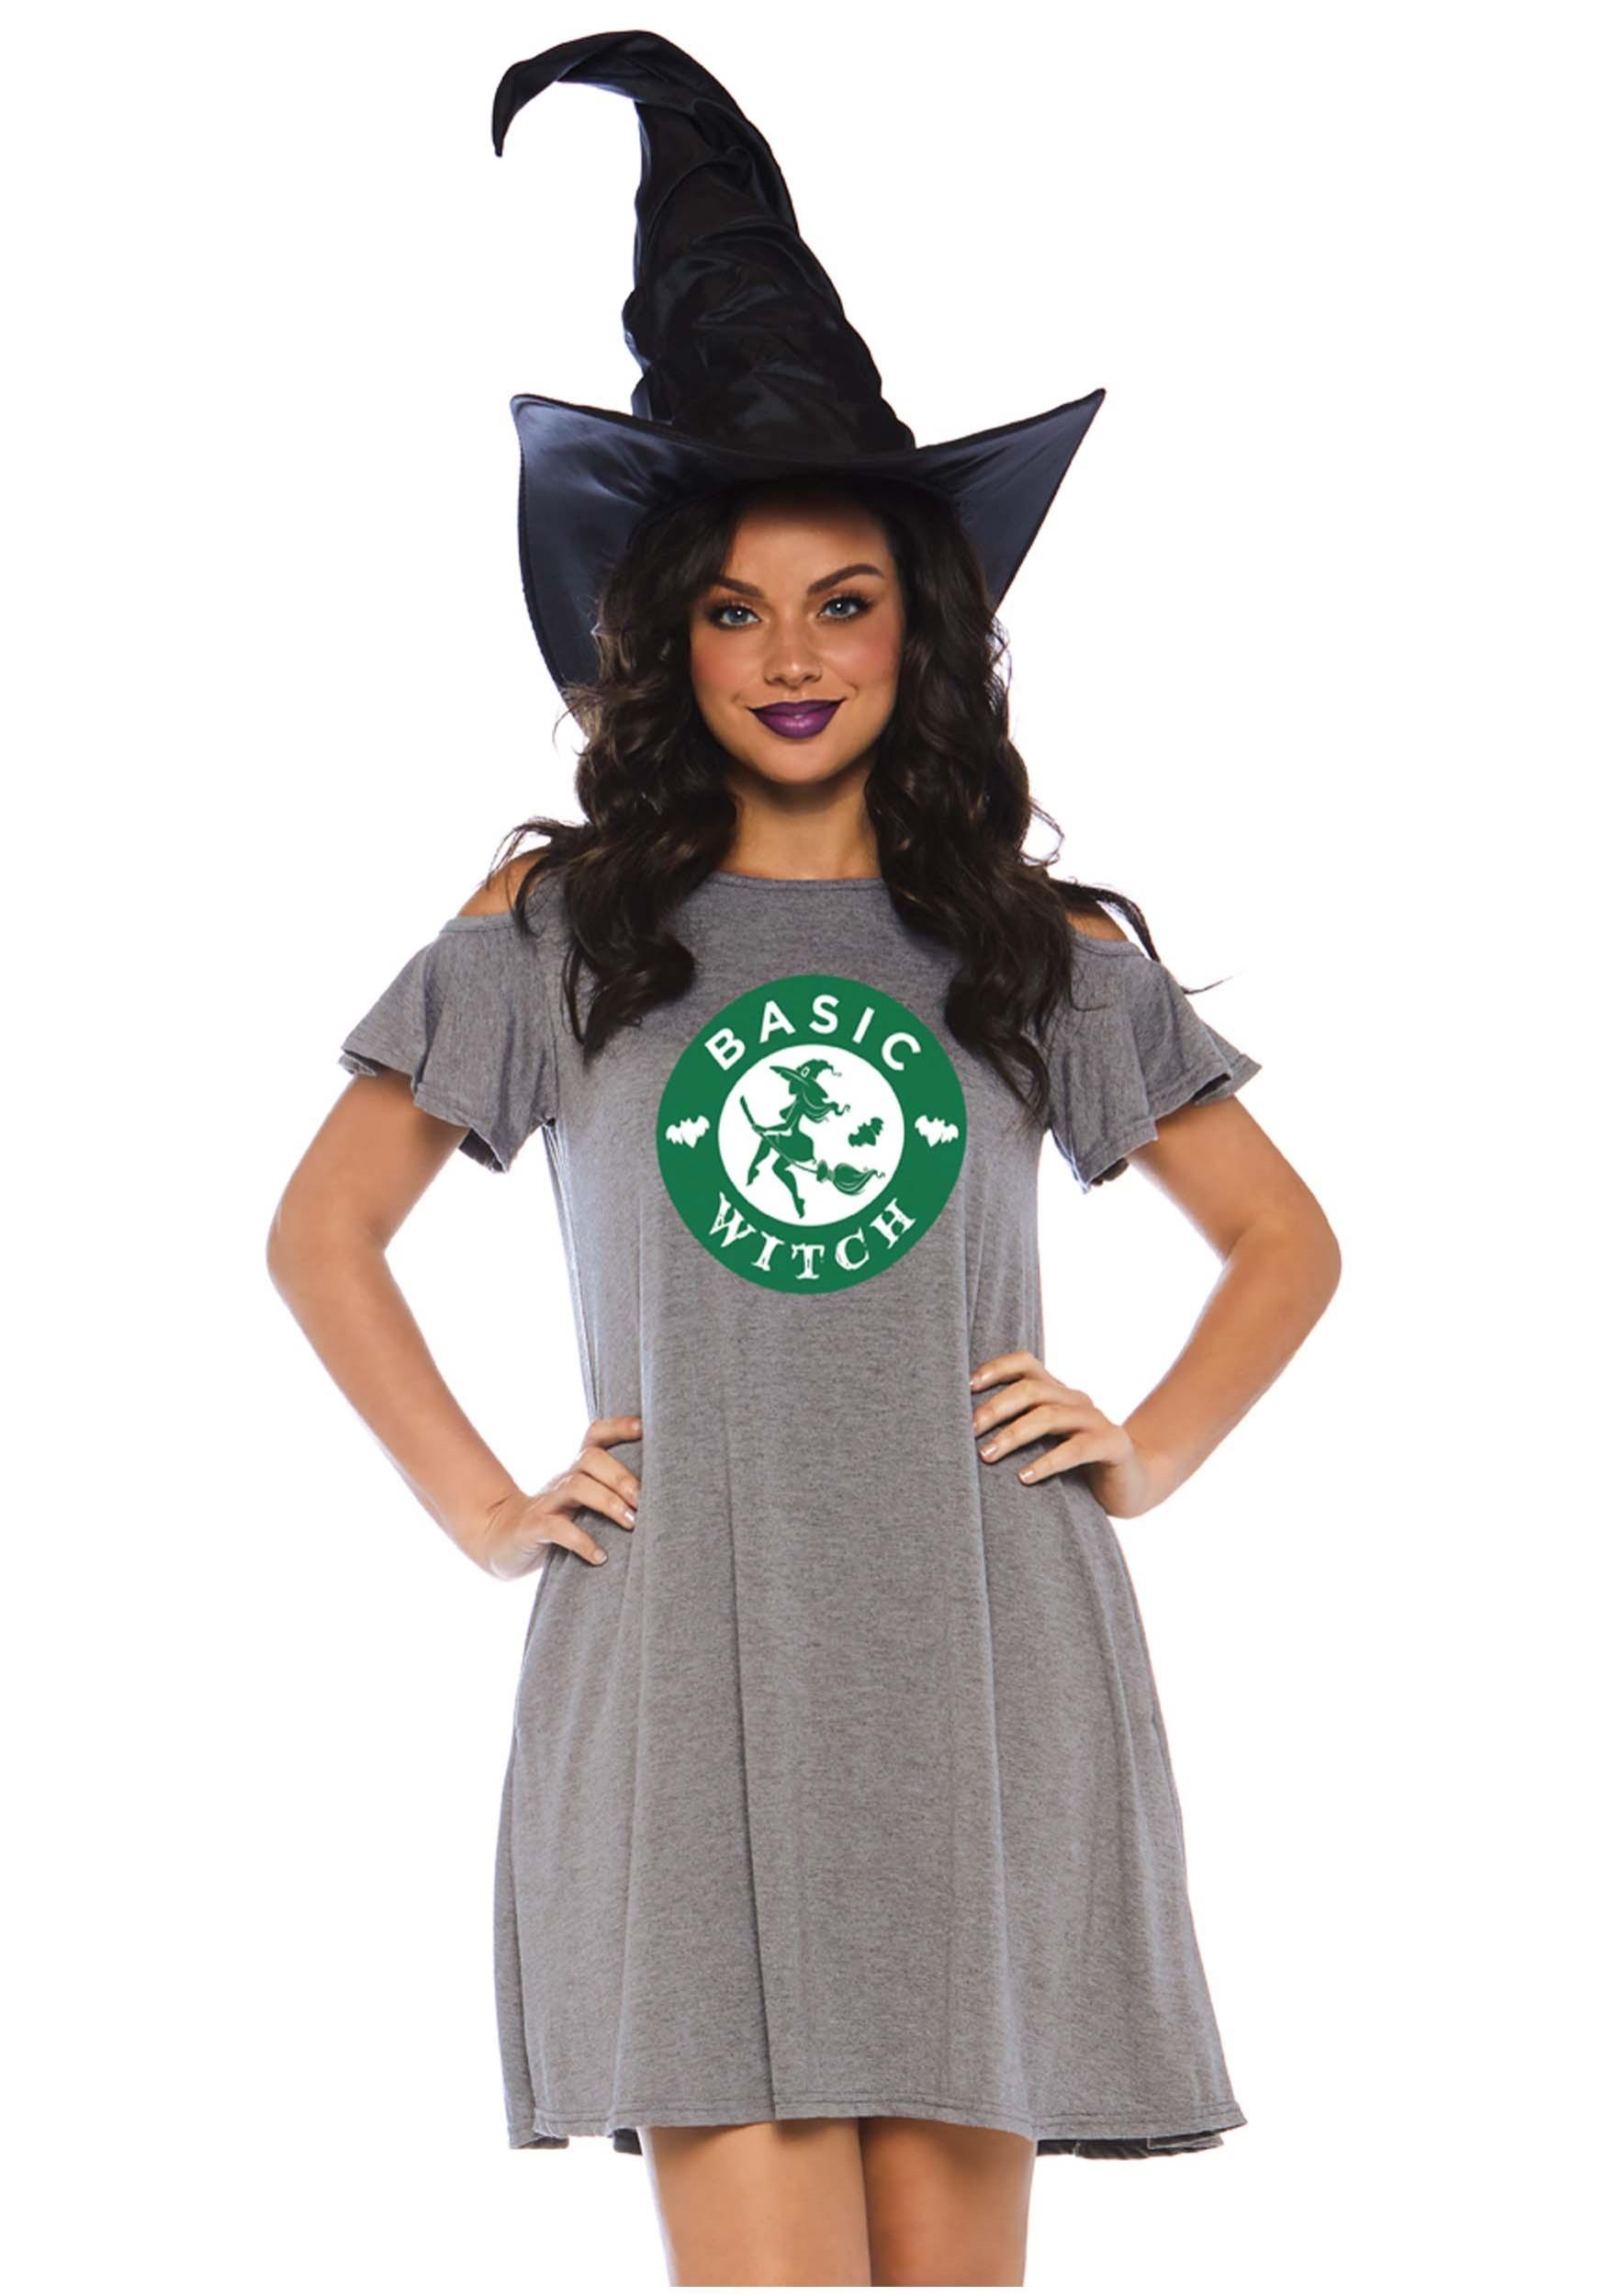 Basic Witch Jersey Dress Costume